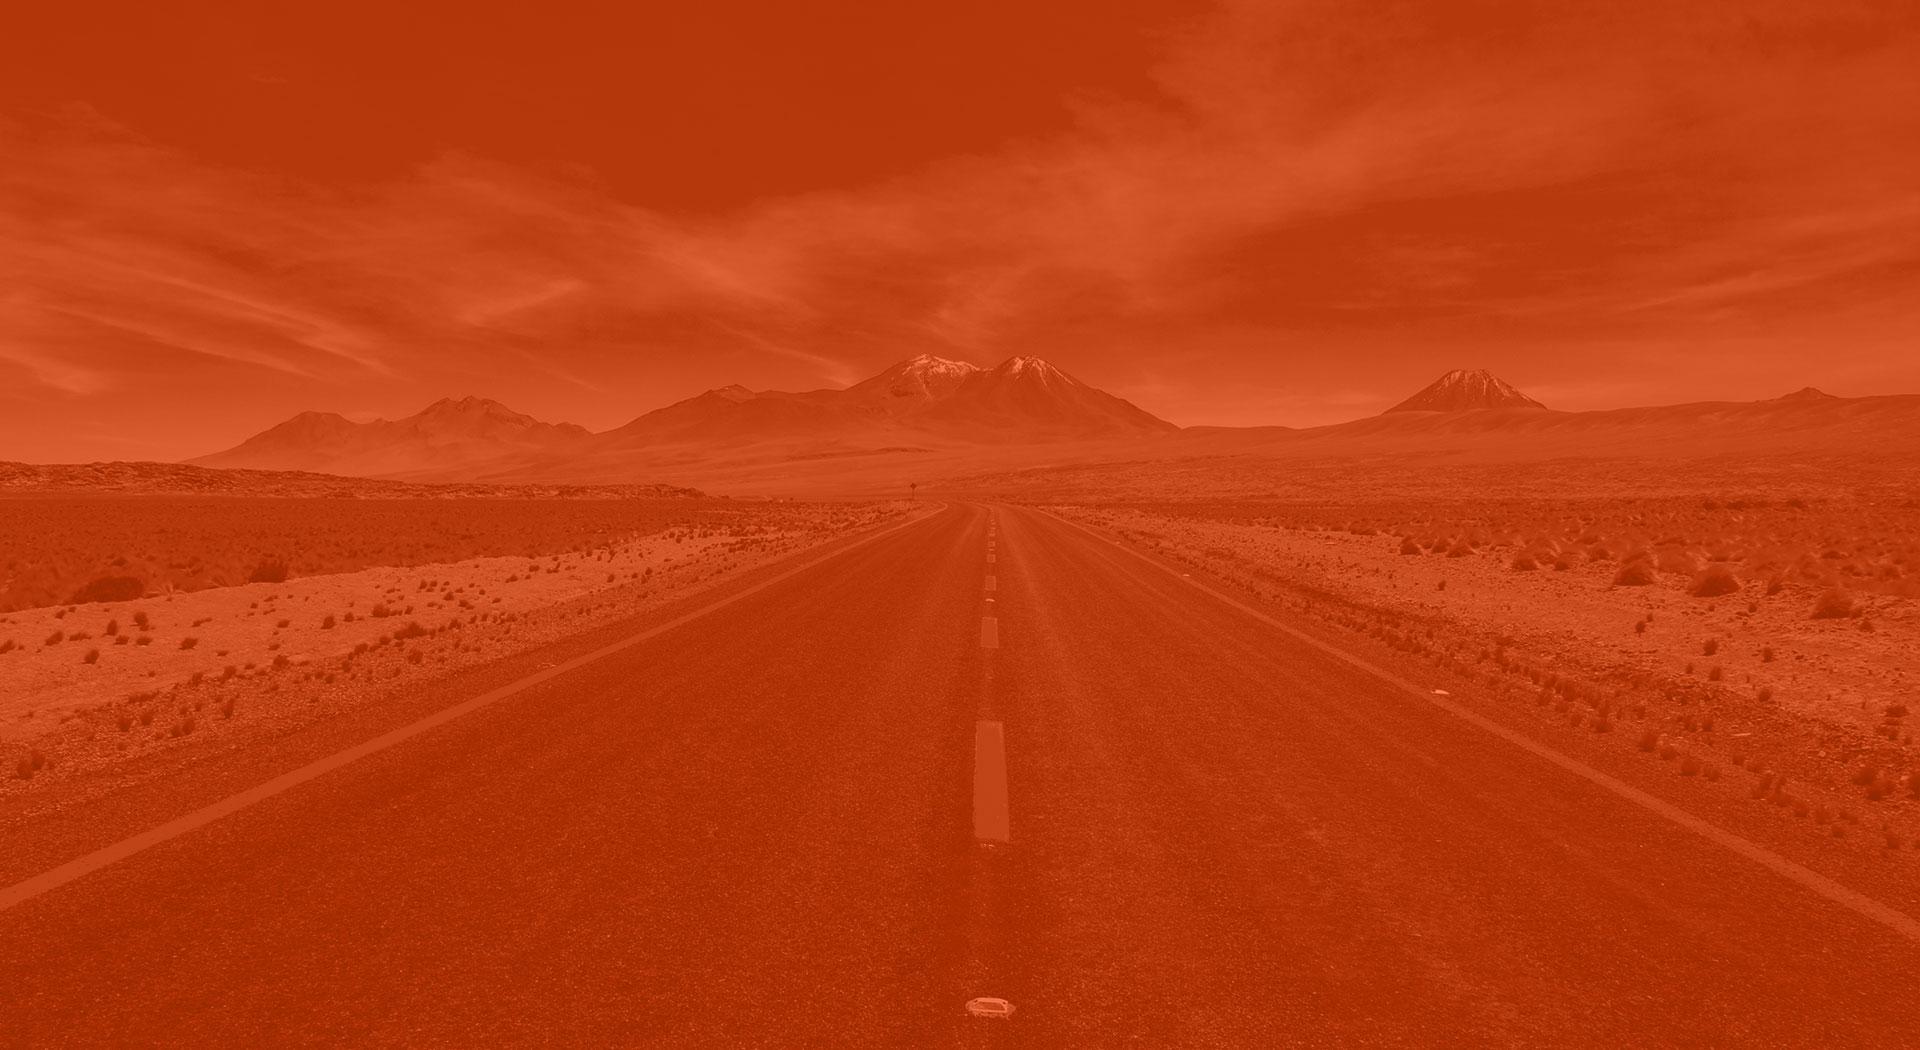 road_ahead_mountains_DARK ORAGE